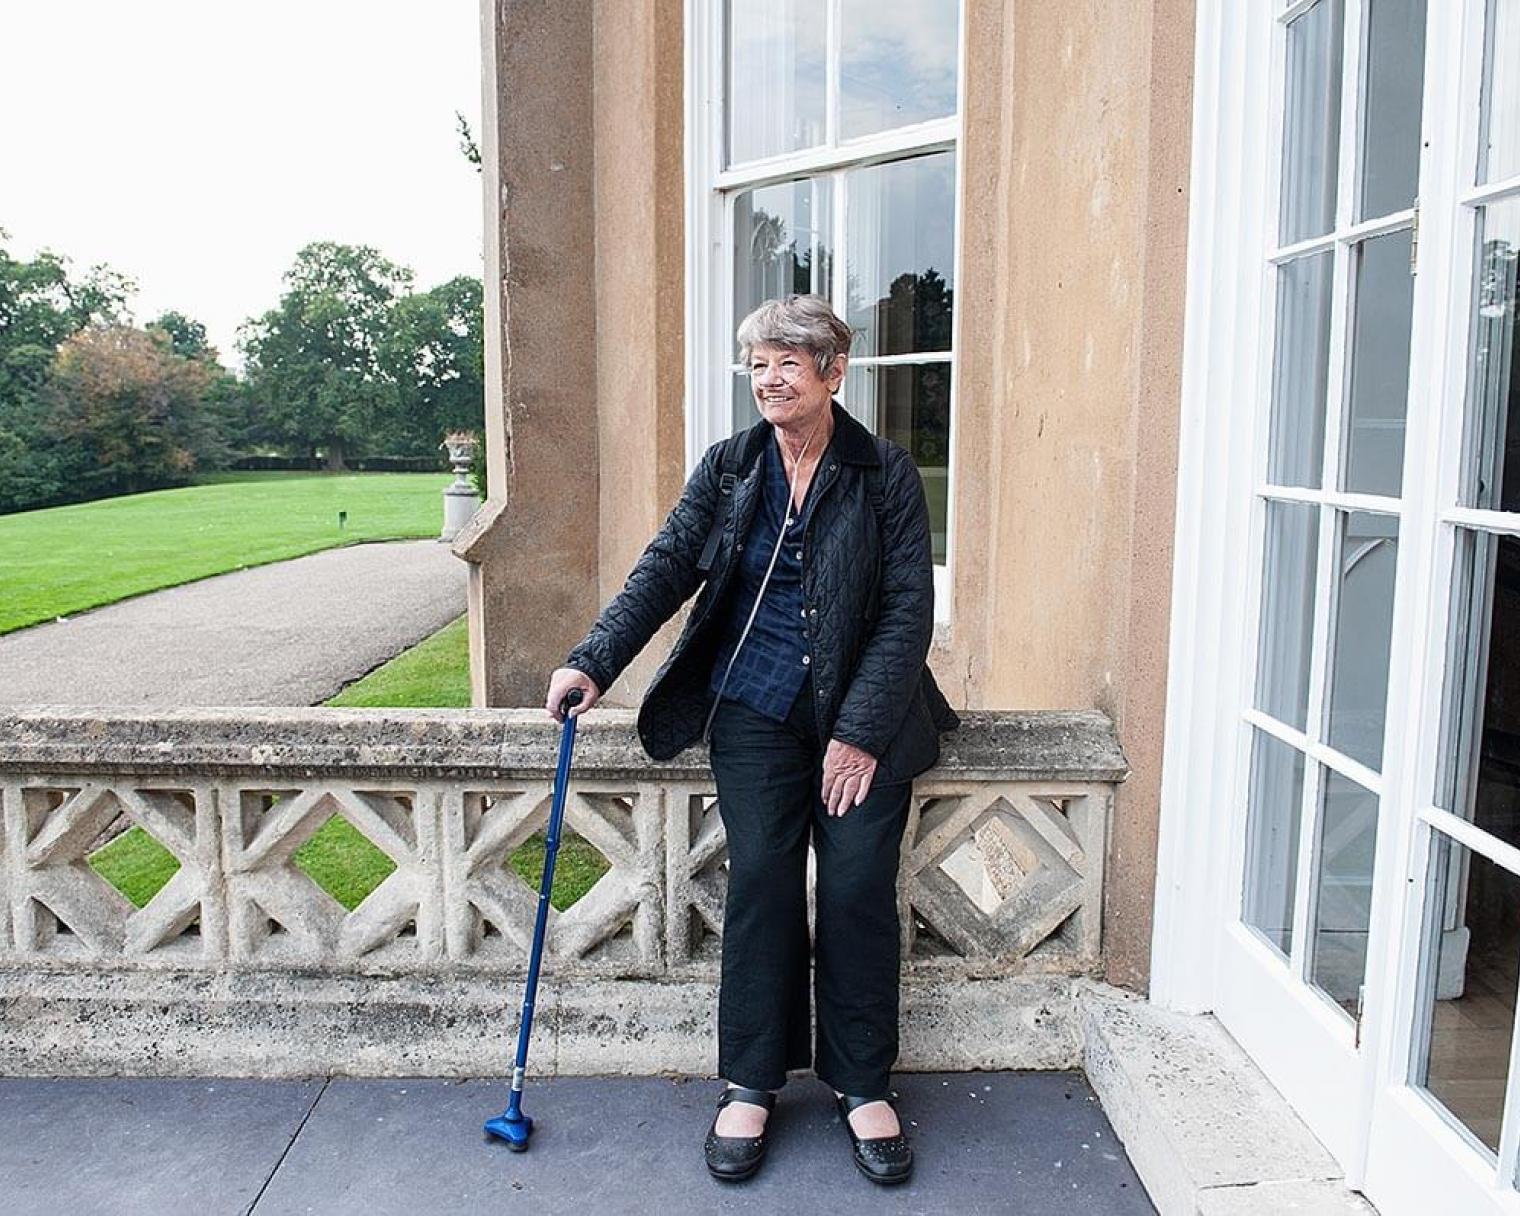 Elderly lady using oxygen tubes whilst walking around